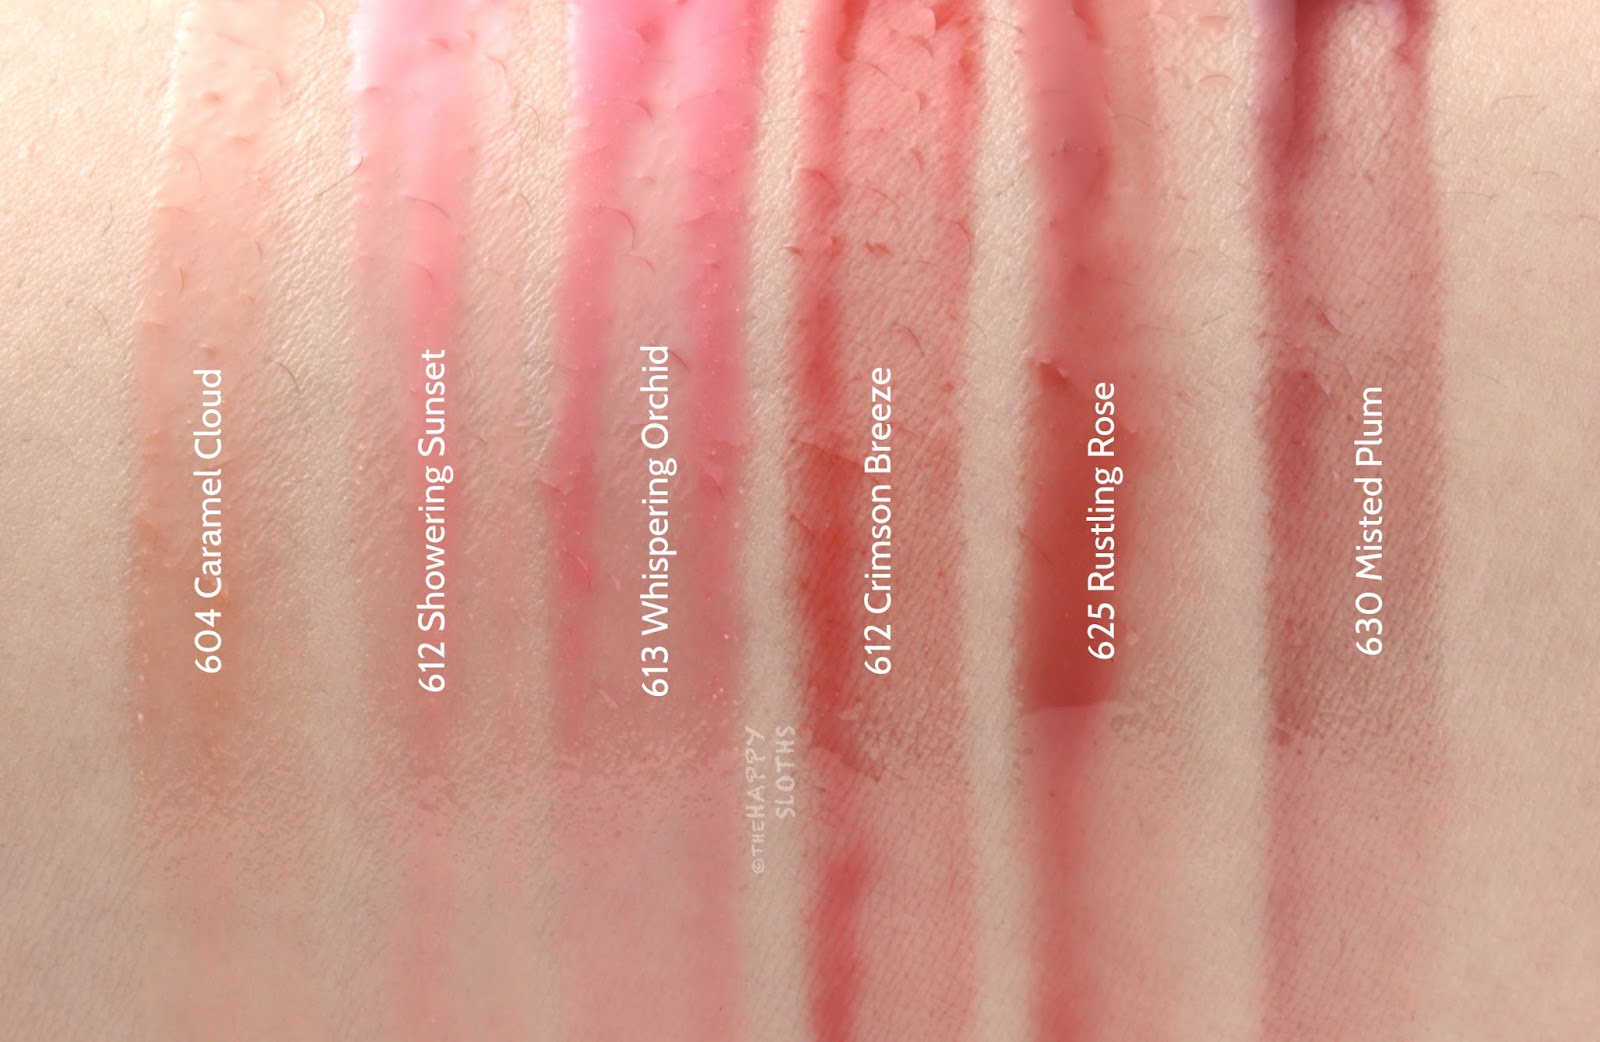 Tinted Lip Balm by Burt's Bees #4